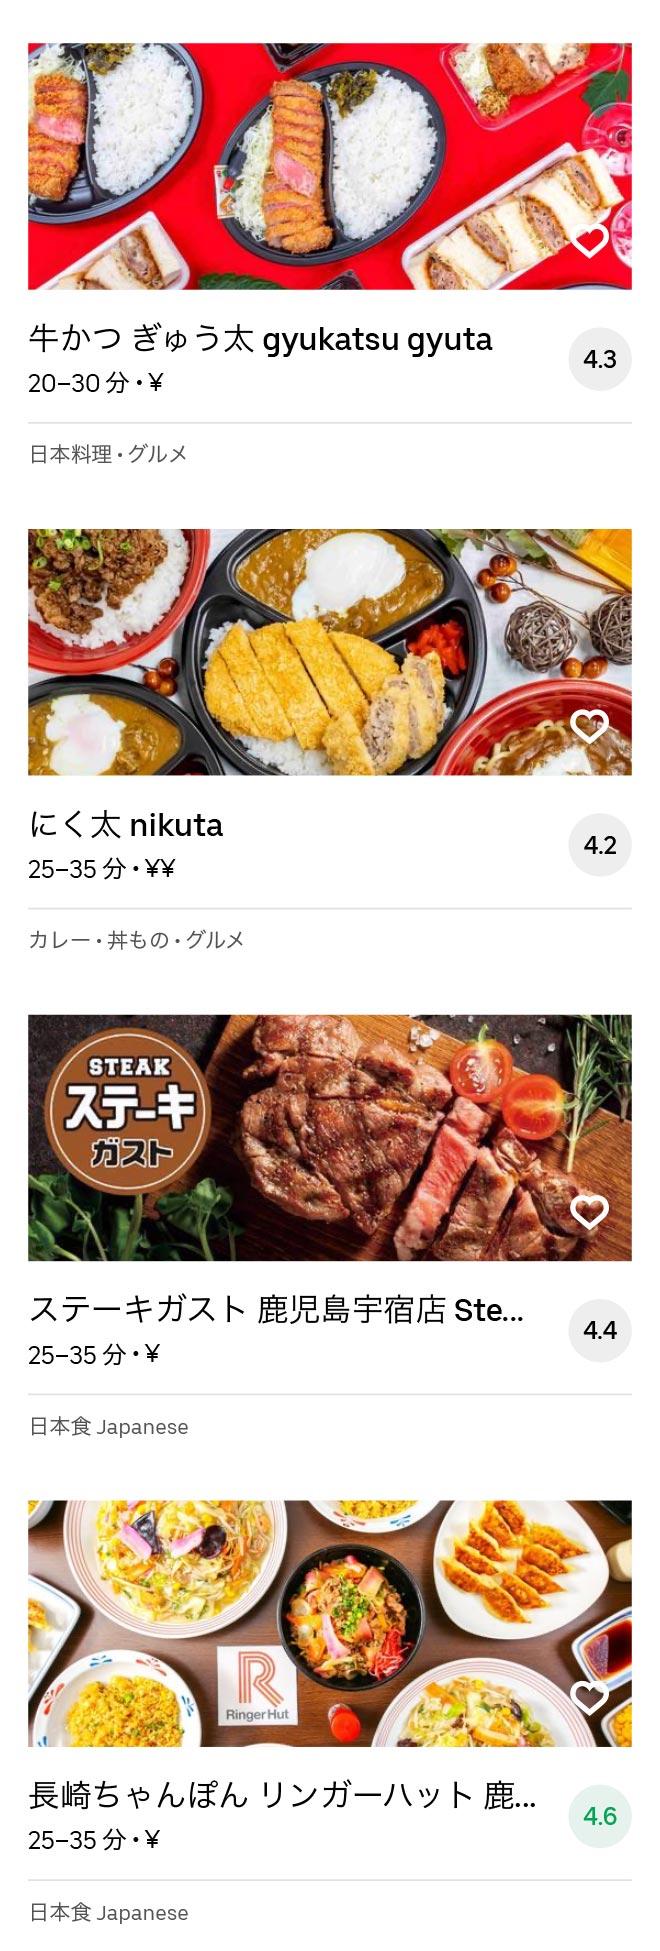 Korimoto menu 2009 3